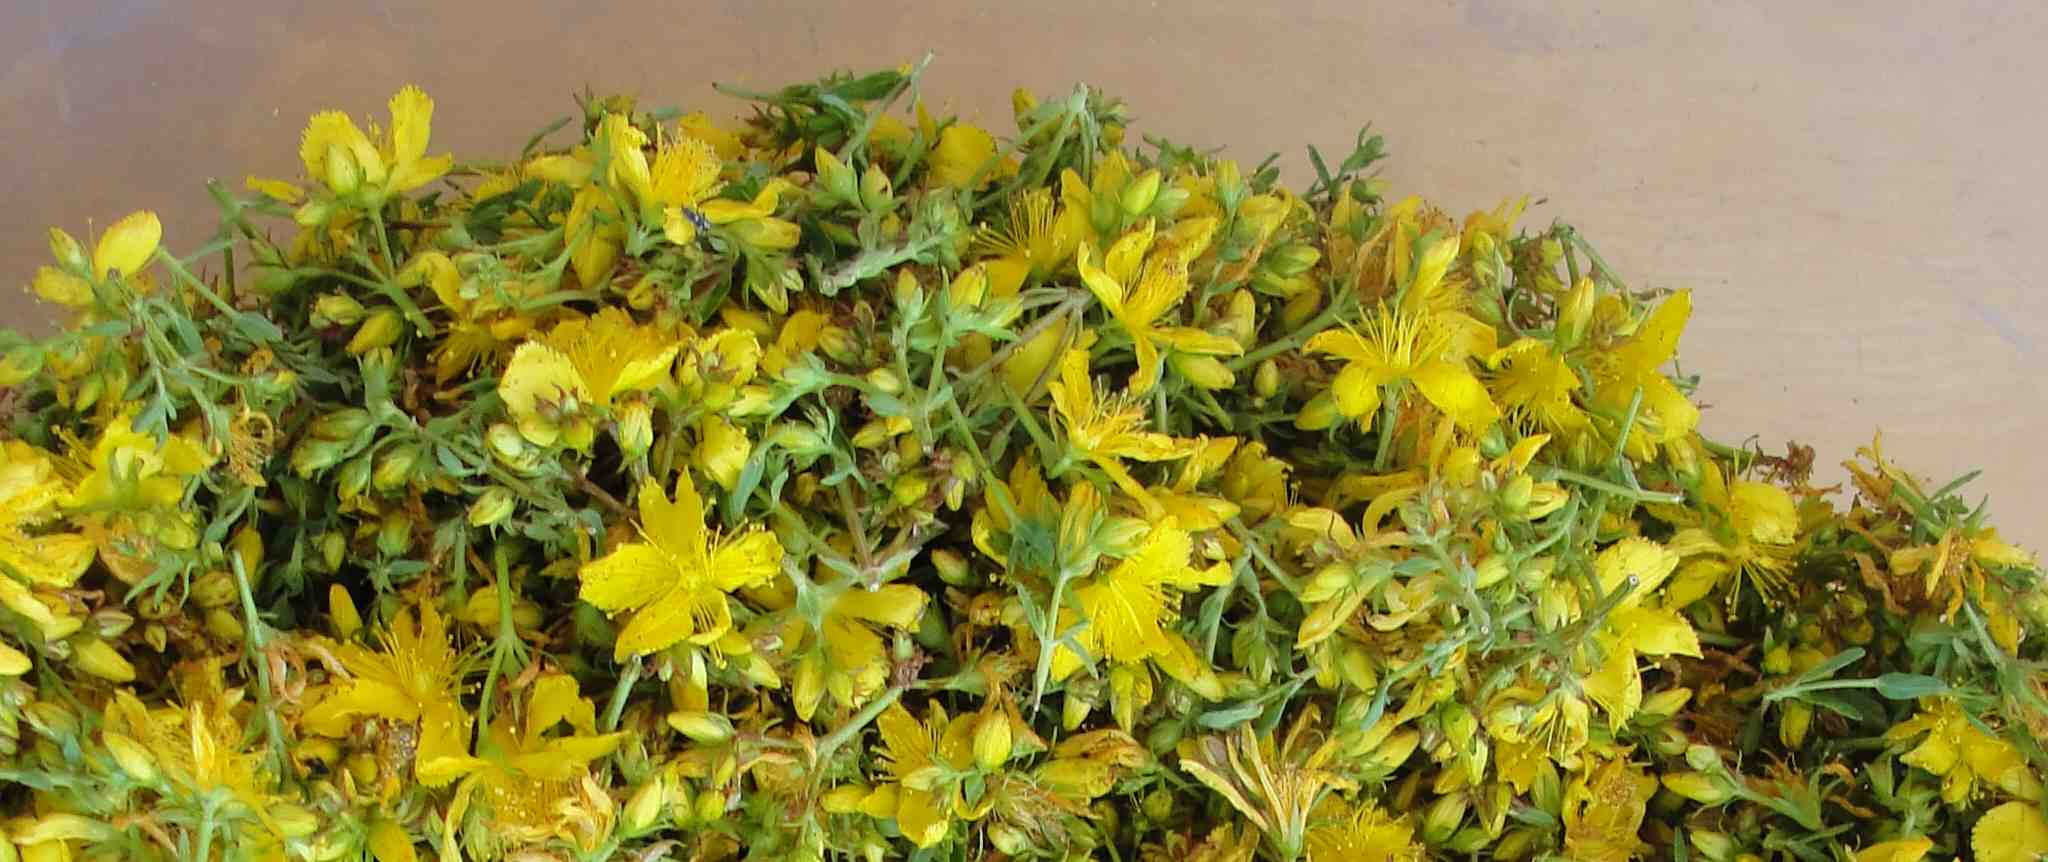 Millepertuis (Hypericum perforatum) - Photo AltheaProvence